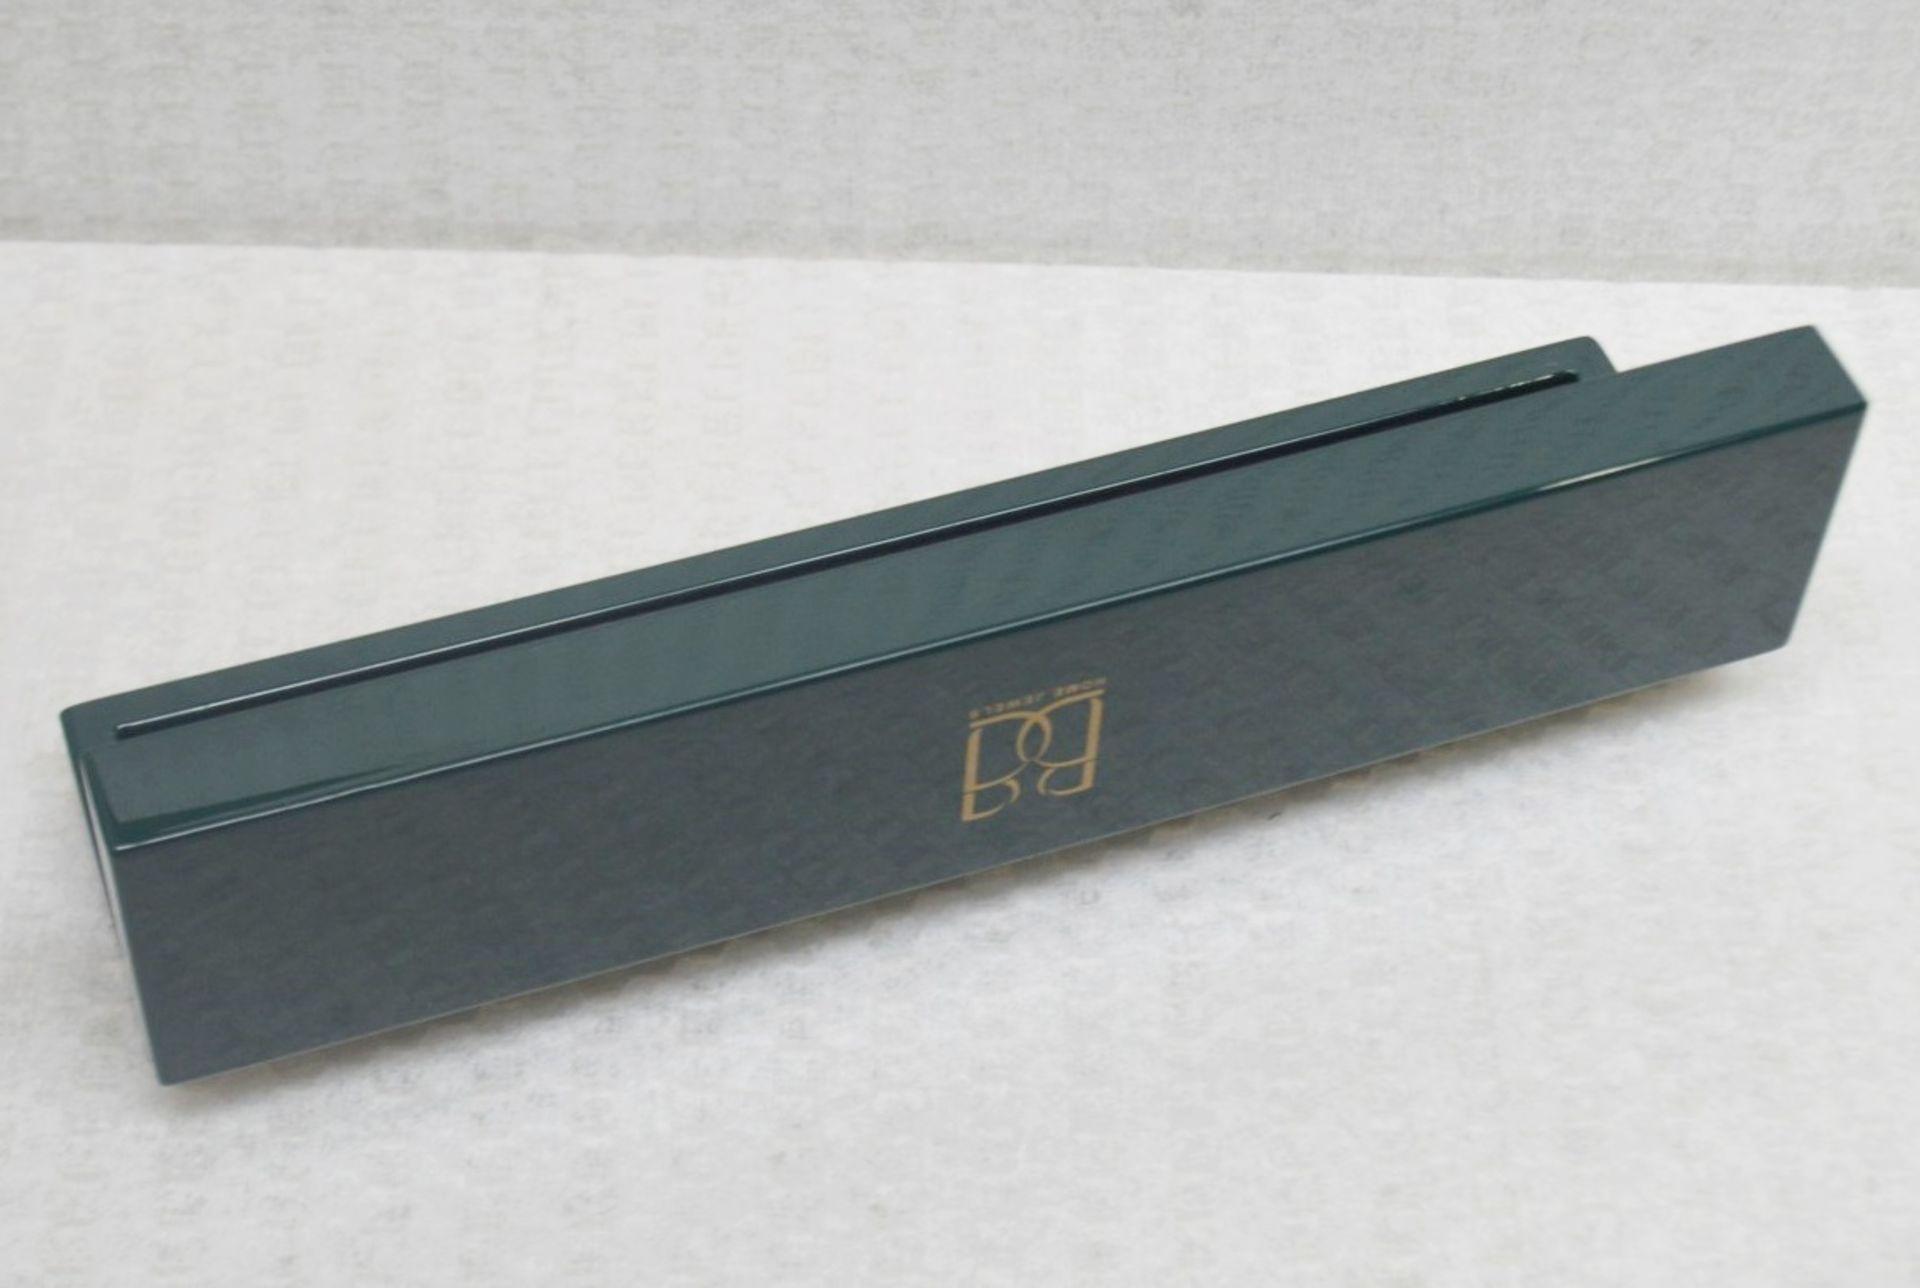 1 x BALDI 'Home Jewels' Italian Hand-crafted Artisan MISBAHA Prayer Beads In Green Malachite And - Image 2 of 5